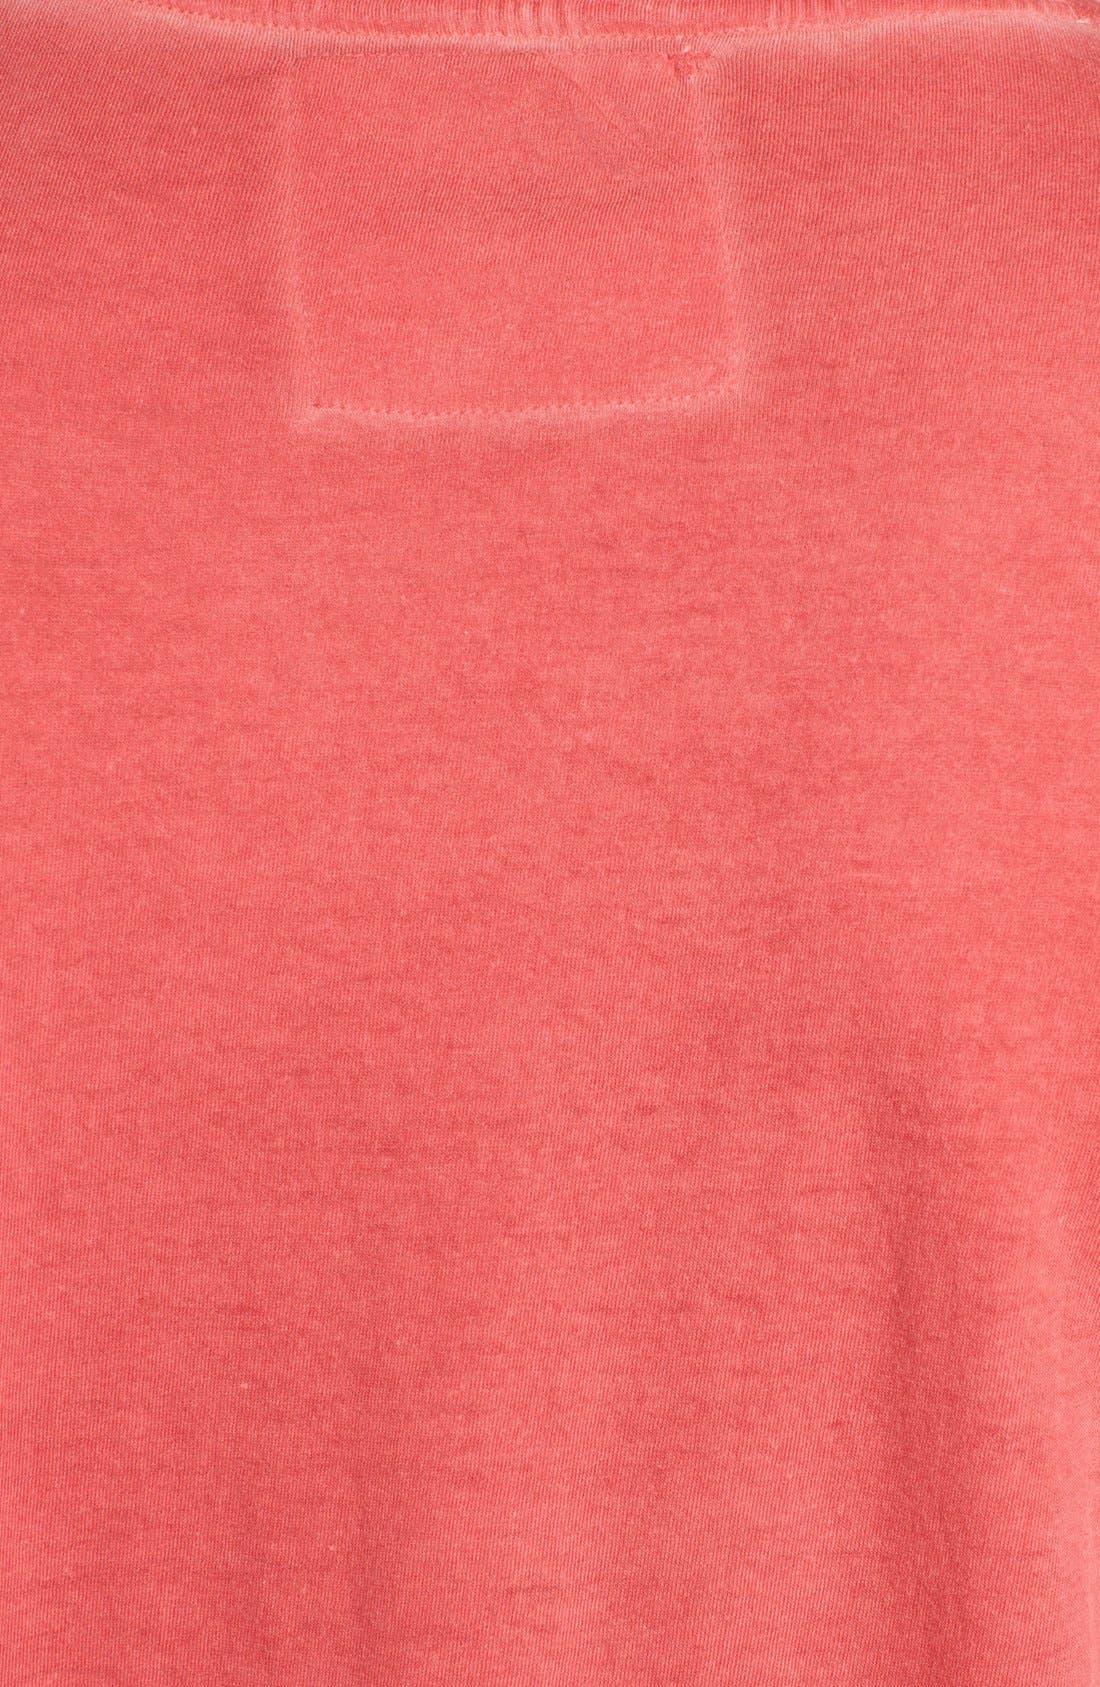 Alternate Image 3  - Red Jacket 'Angels - NIB' T-Shirt